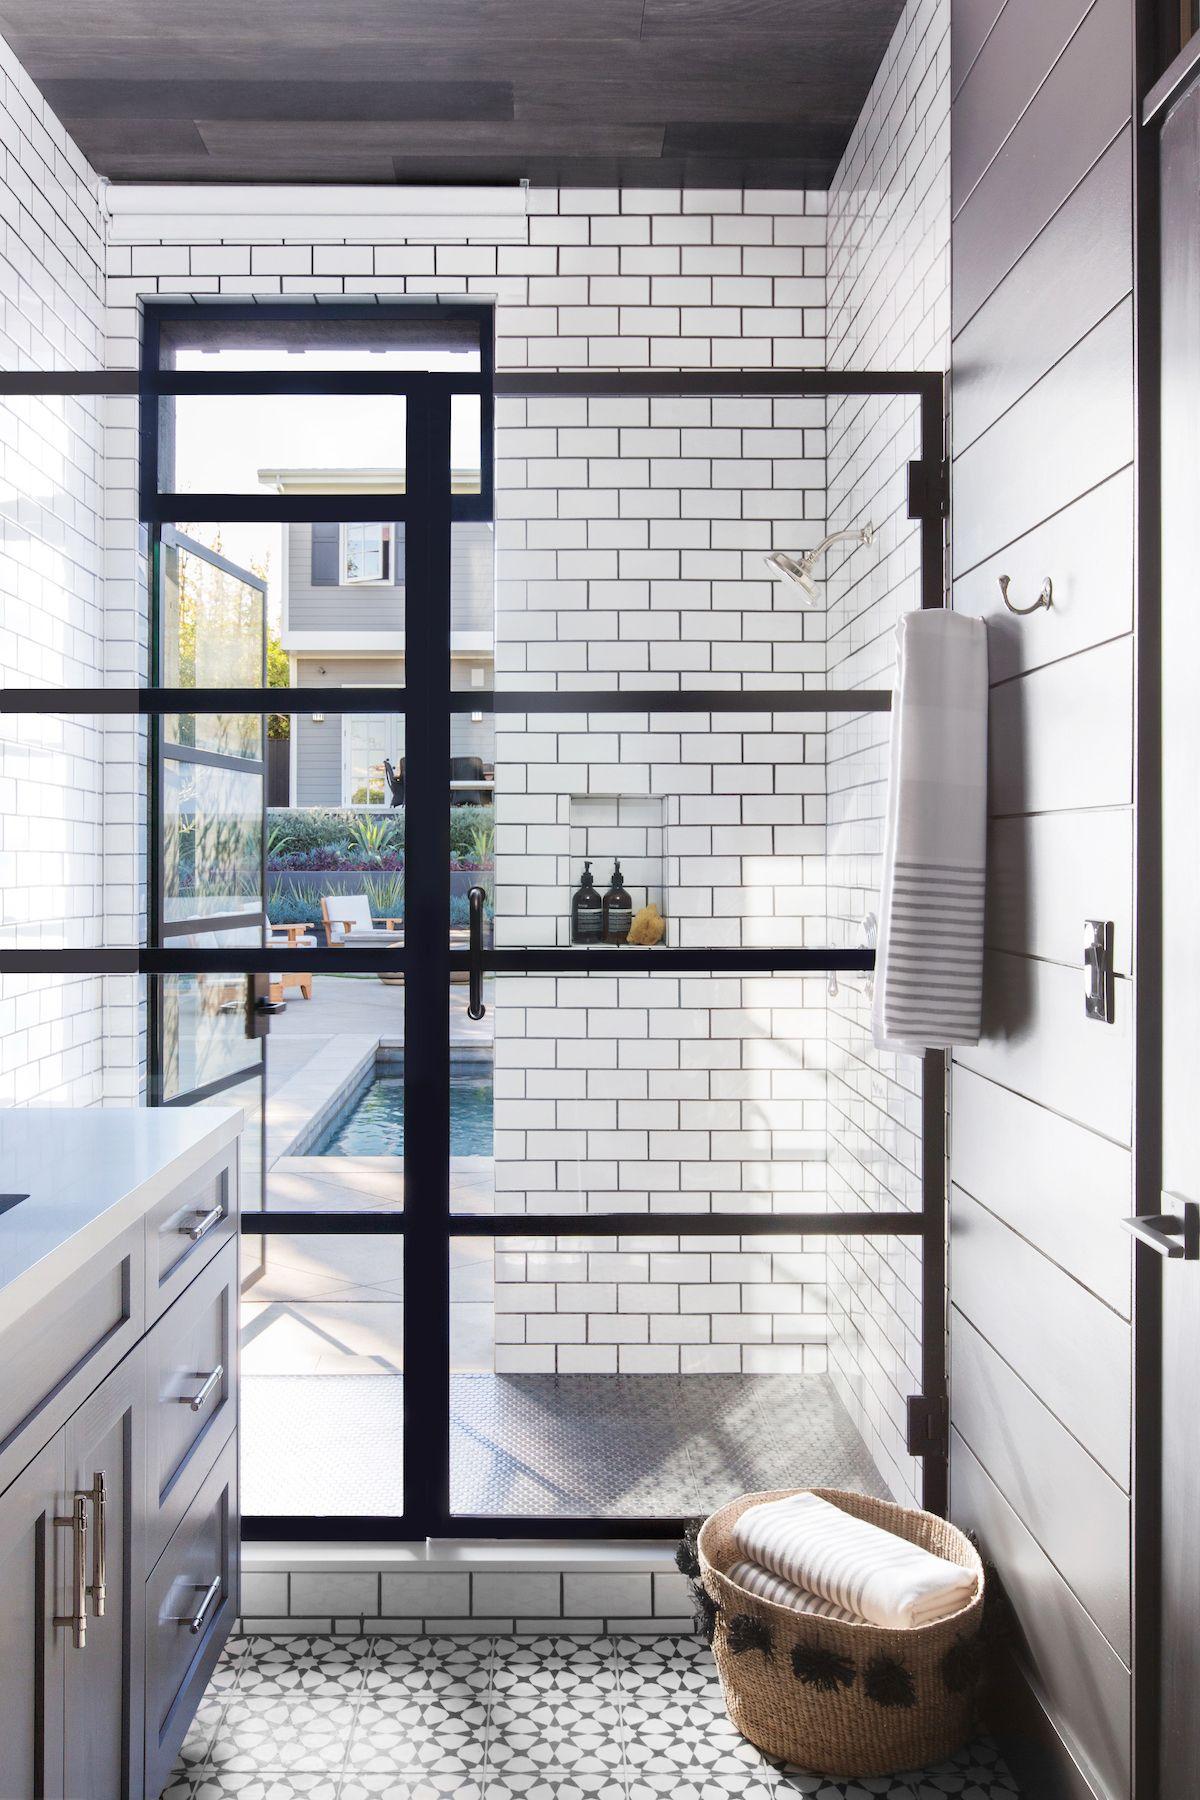 15 Best Subway Tile Bathroom Designs in 2020 - Subway Tile ... on Bathroom Ideas Subway Tile  id=42827